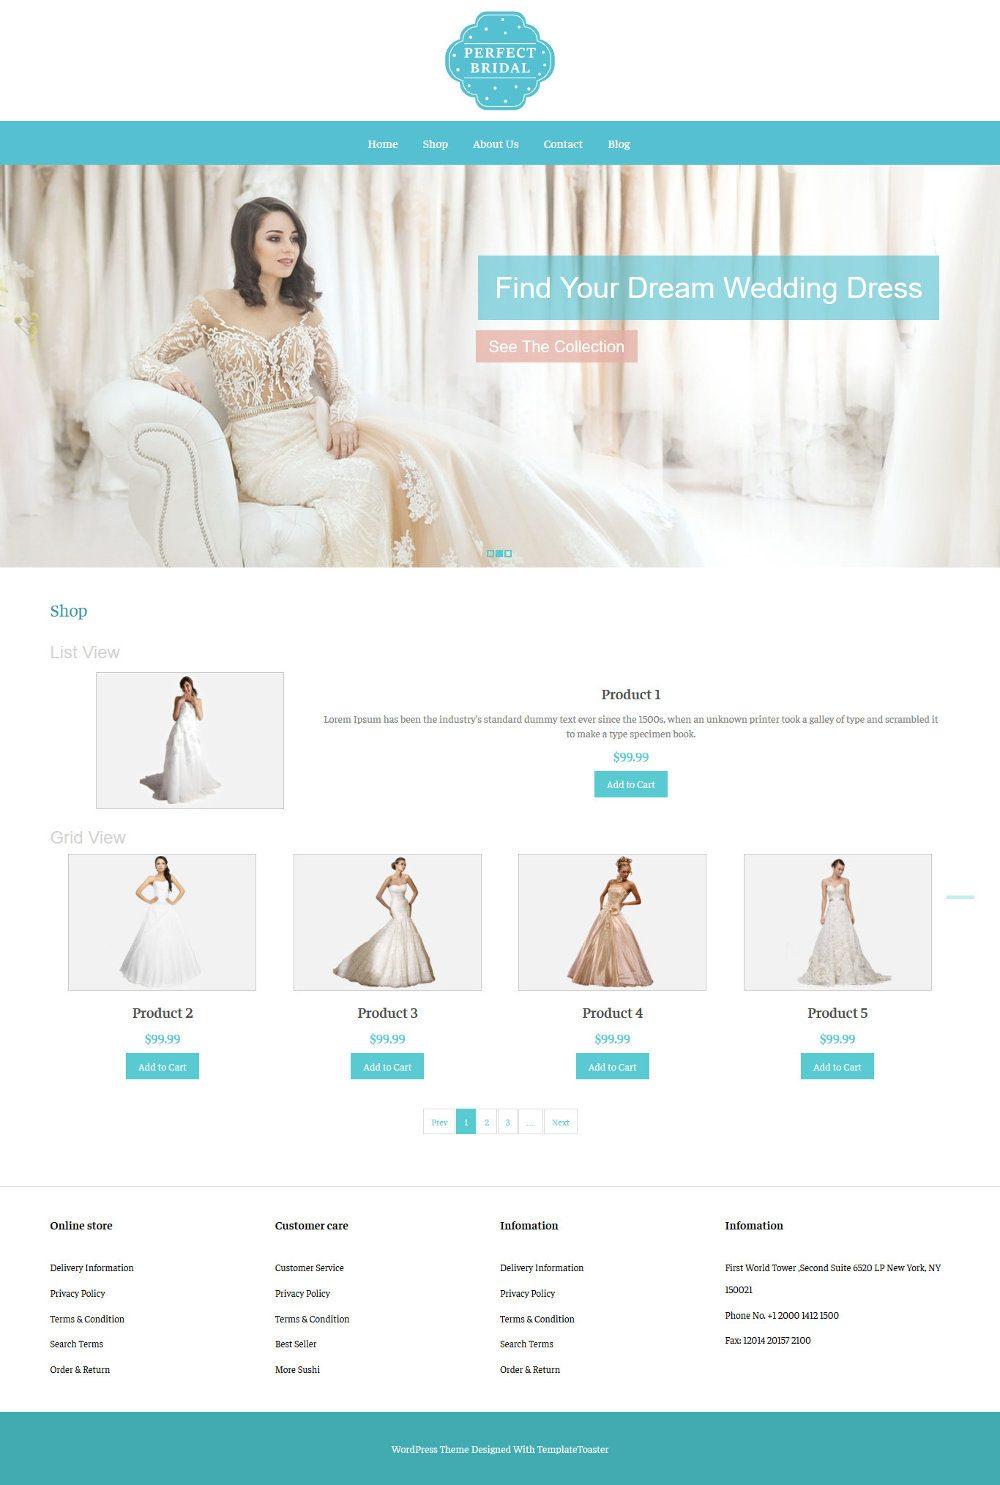 Perfect Bridal Wedding Dresses WooCommerce Theme